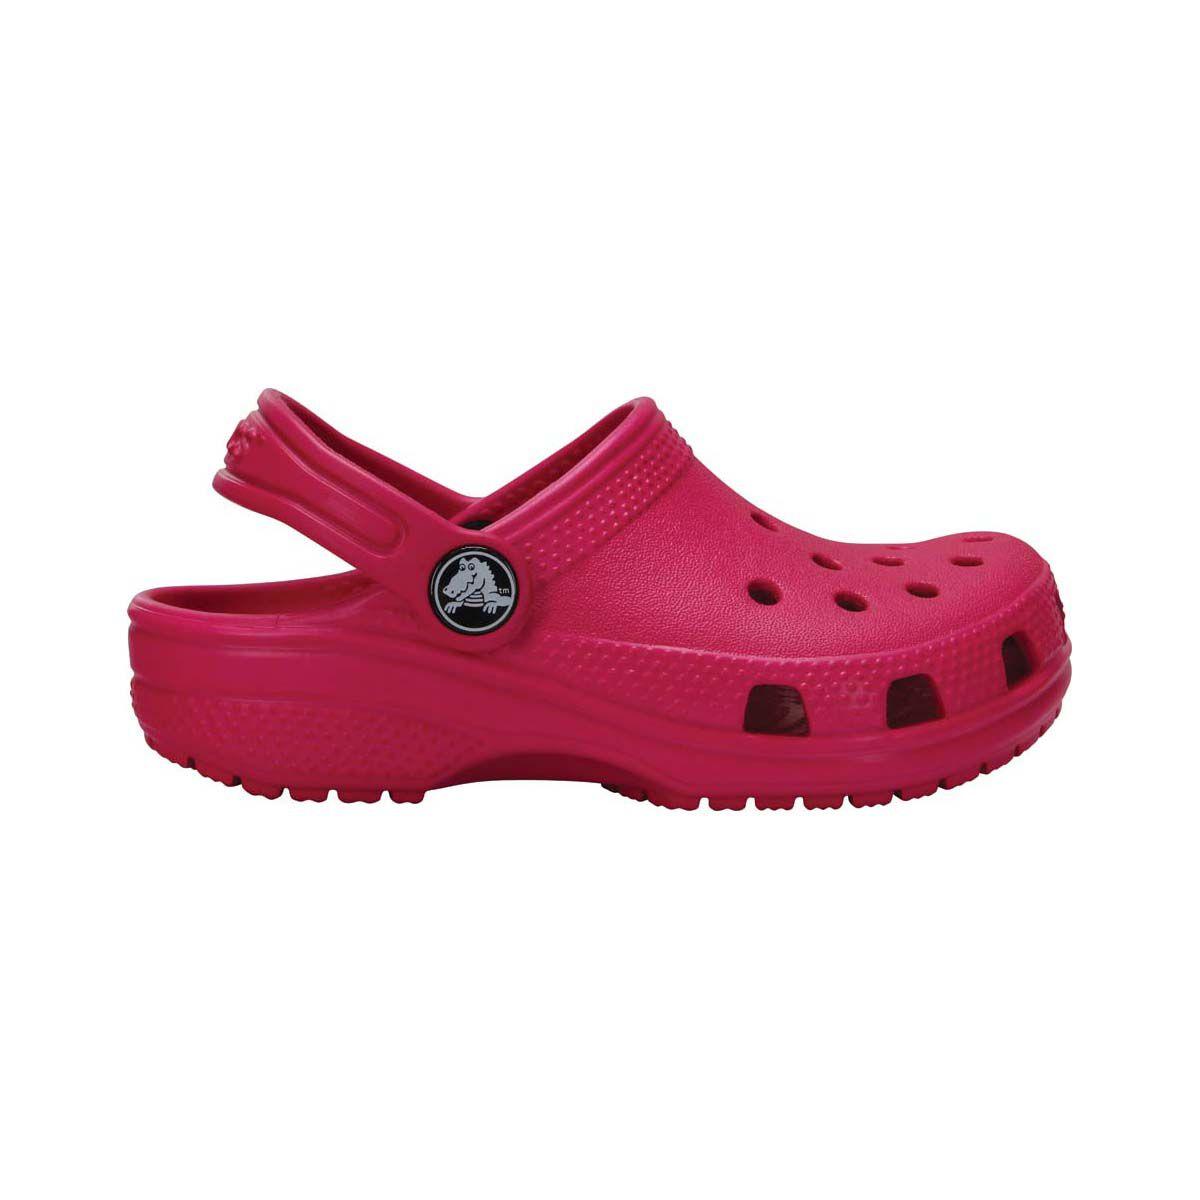 Crocs Kids' Classic Clog | BCF